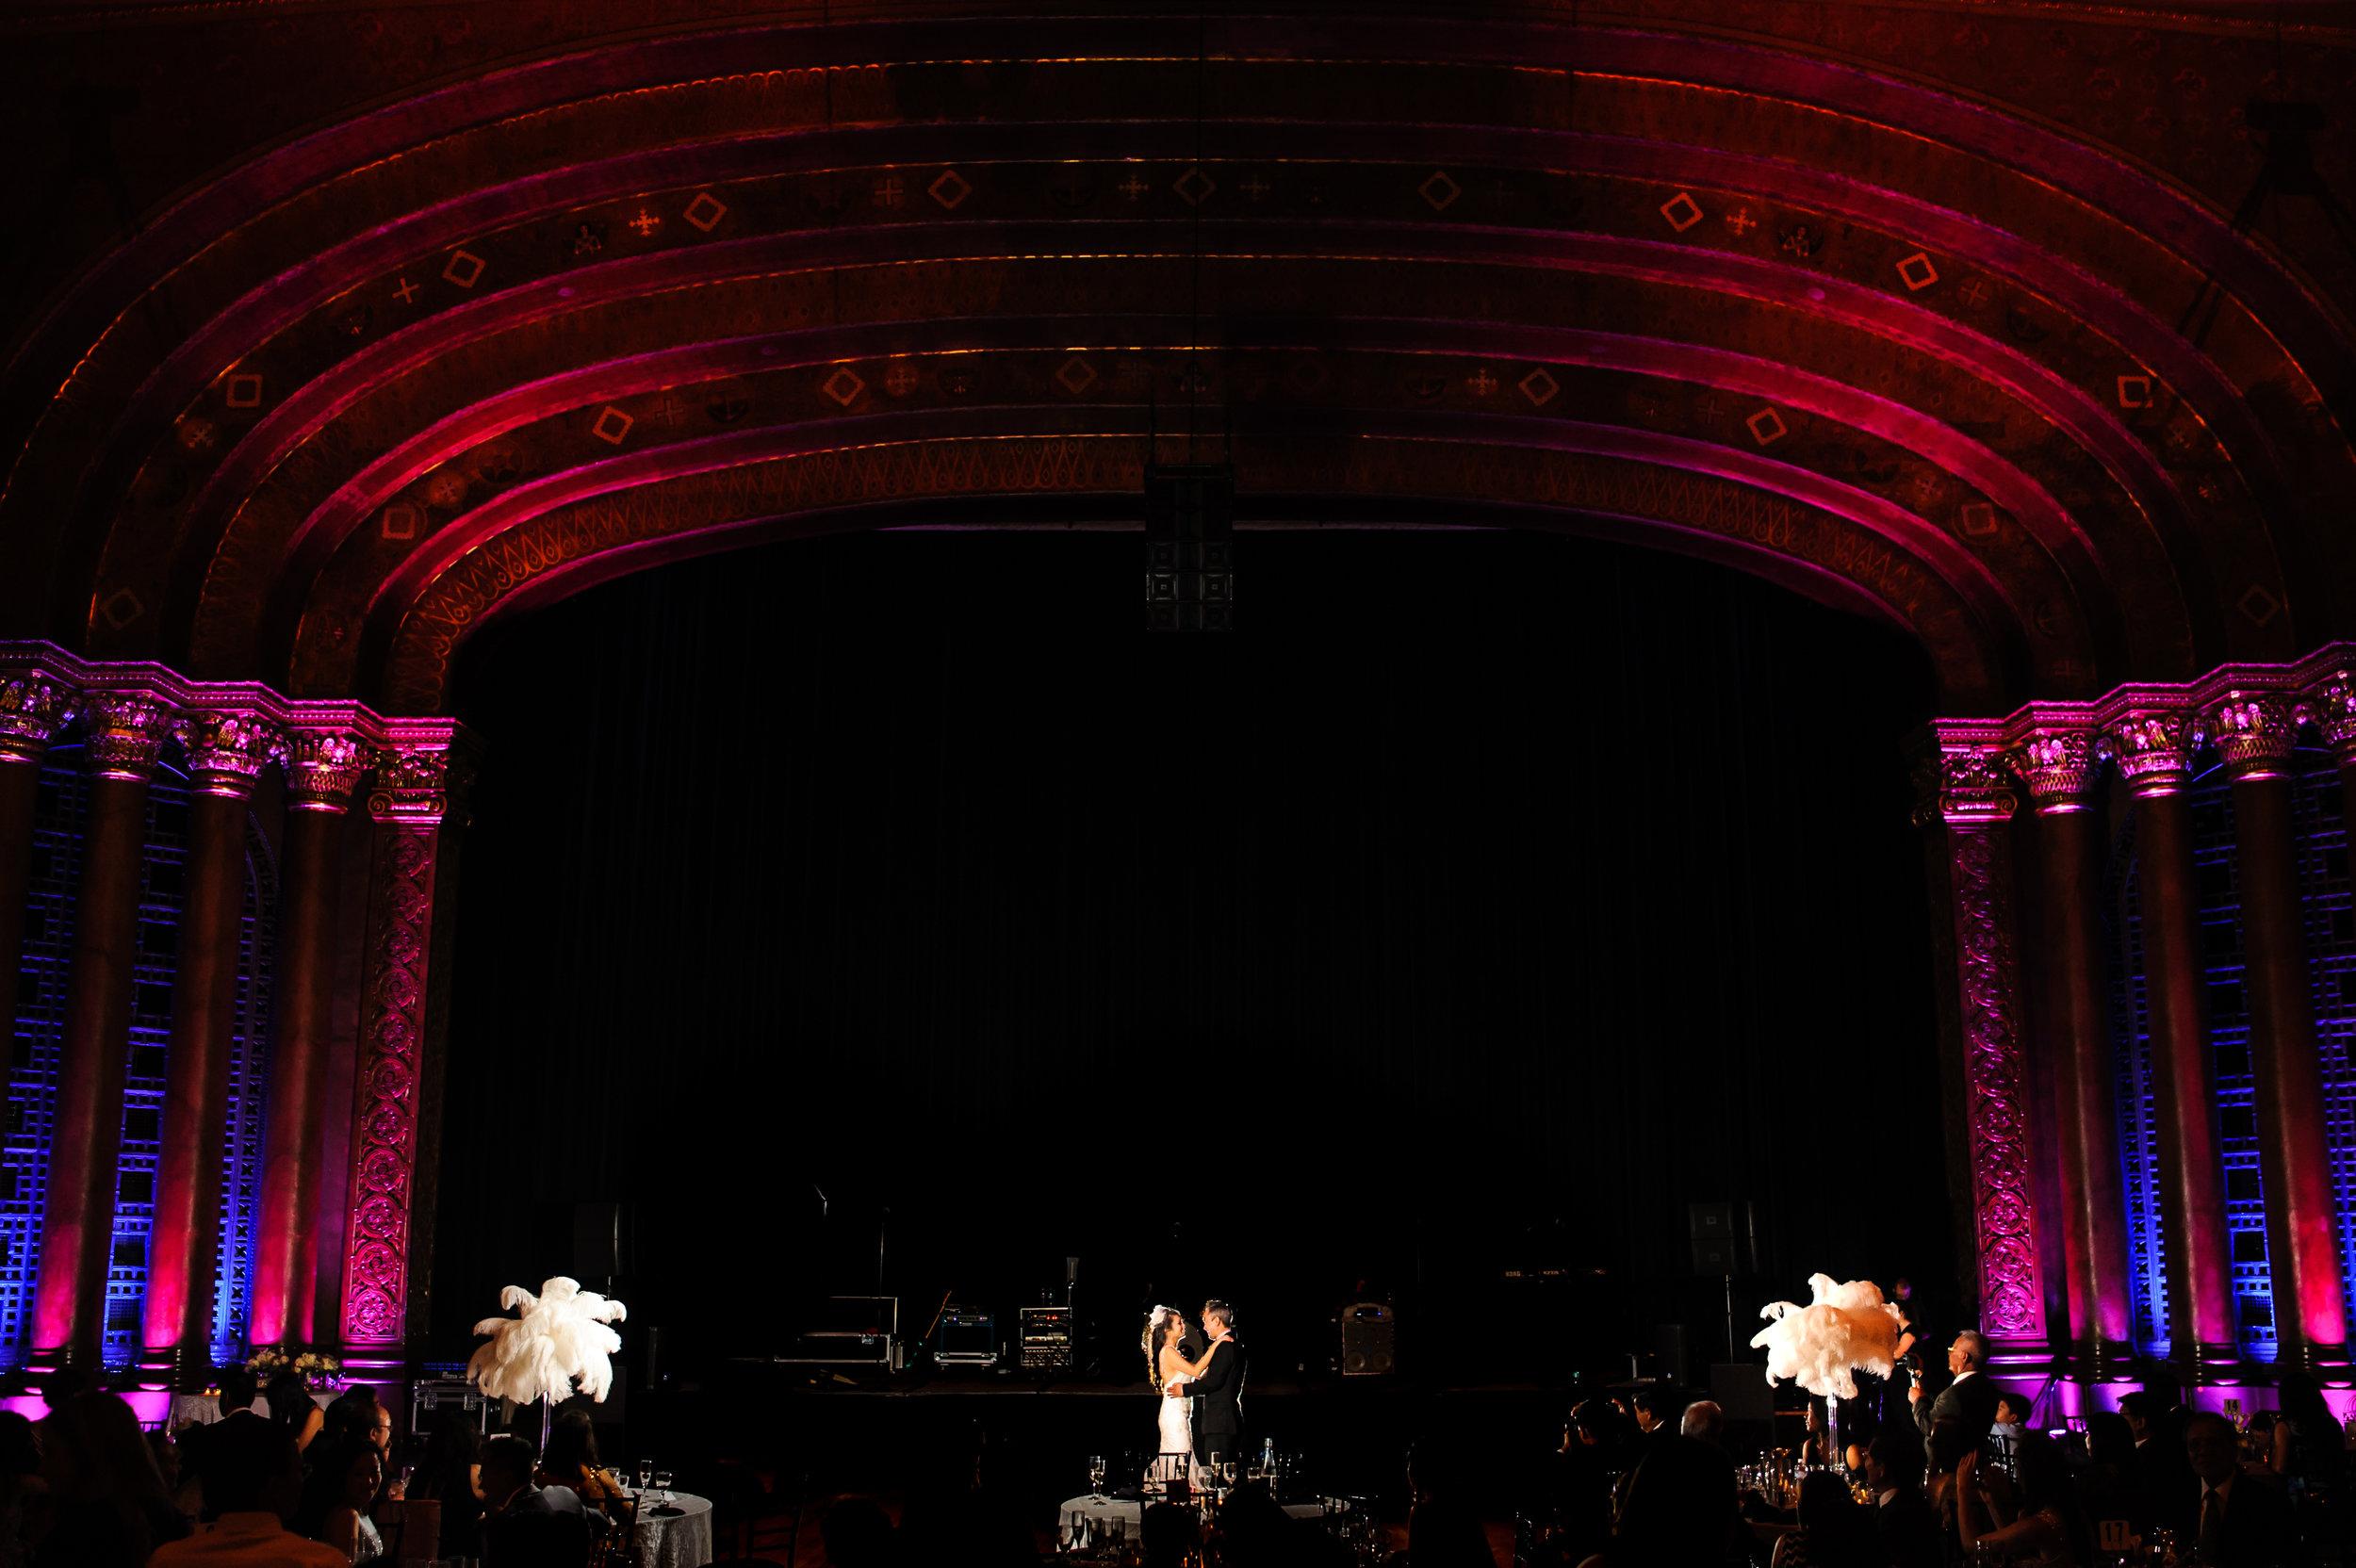 camilla-thuy-067-memorial-auditorium-sacramento-wedding-photographer-katherine-nicole-photography.JPG